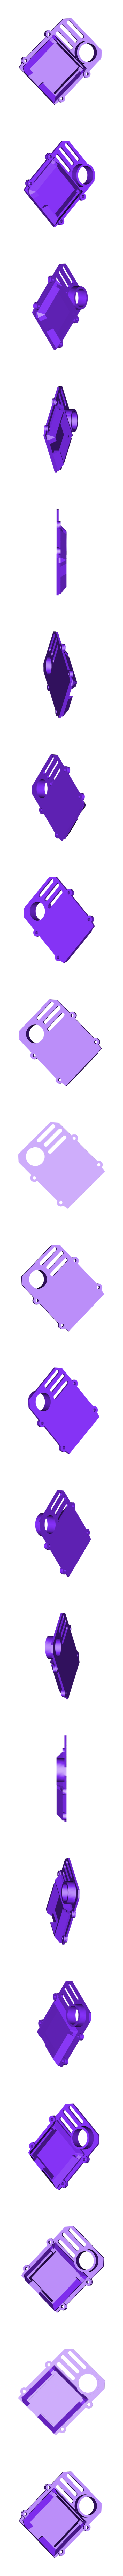 part1_Capot_FC__DC110_fpv.stl Descargar archivo STL gratis DC110 ABS FPV para el Control de SP F3 RACING Vuelo EVO Brush • Modelo para imprimir en 3D, Microdure